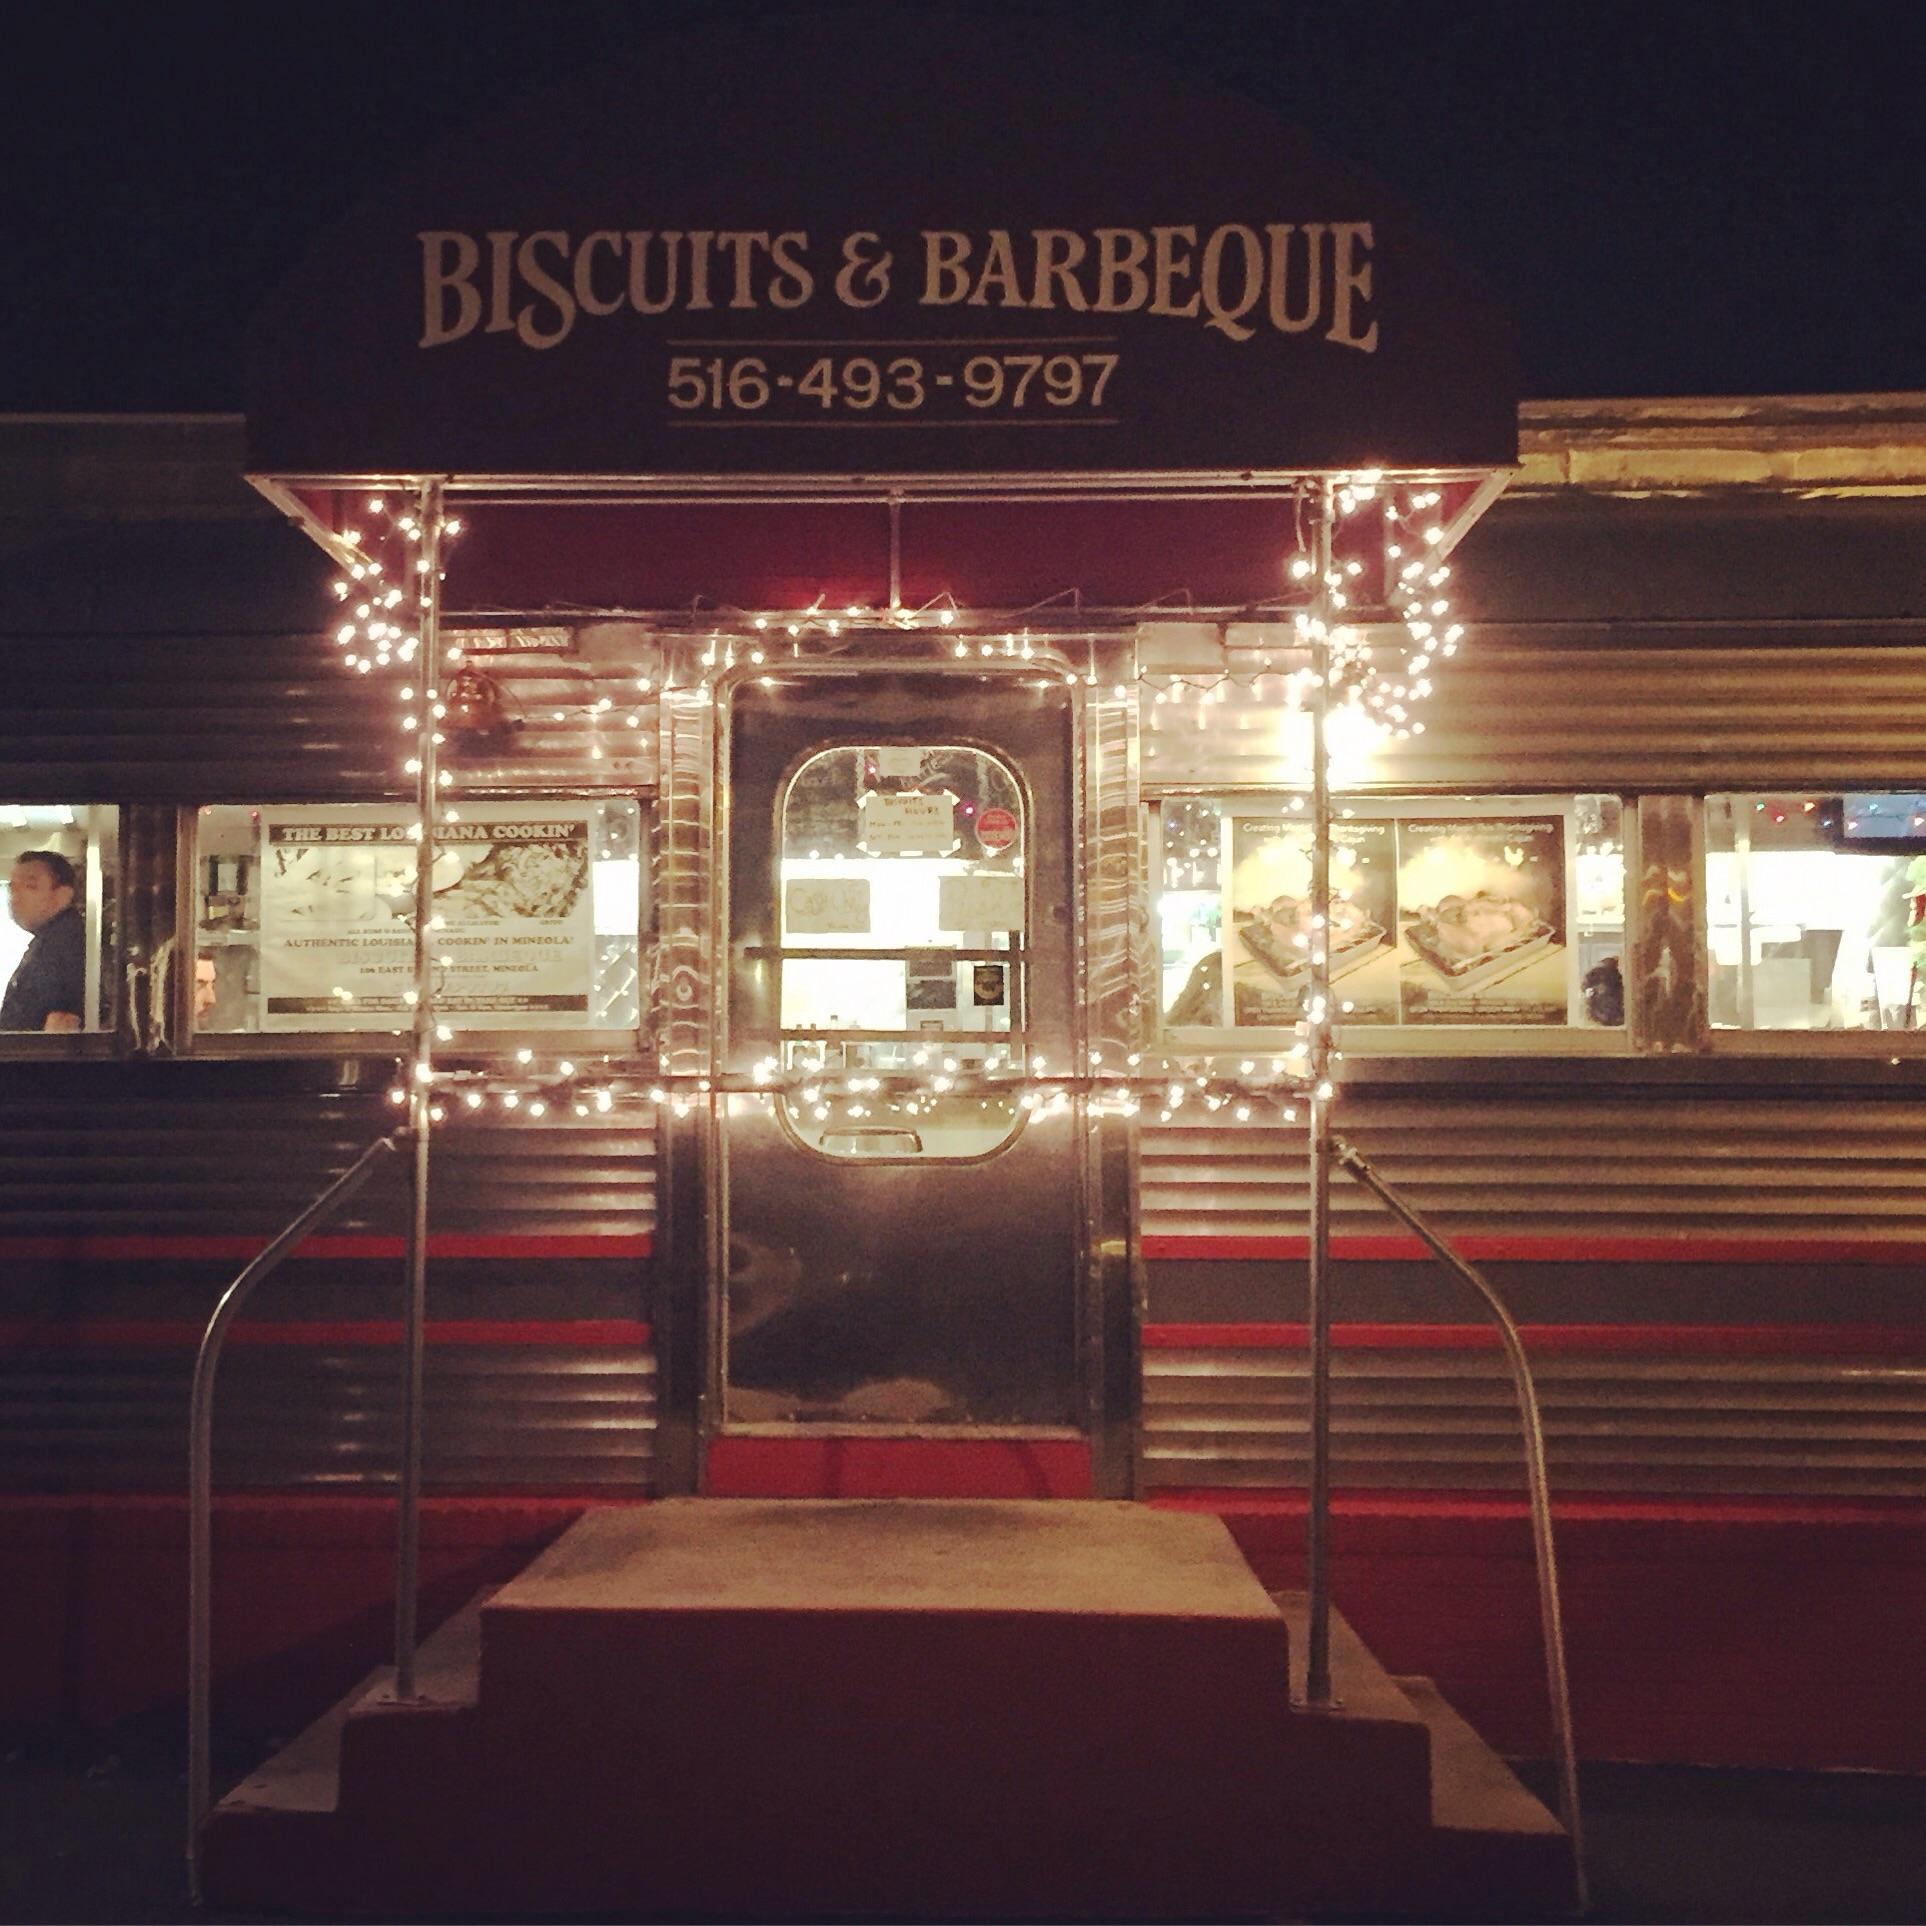 Biscuits & Barbeque